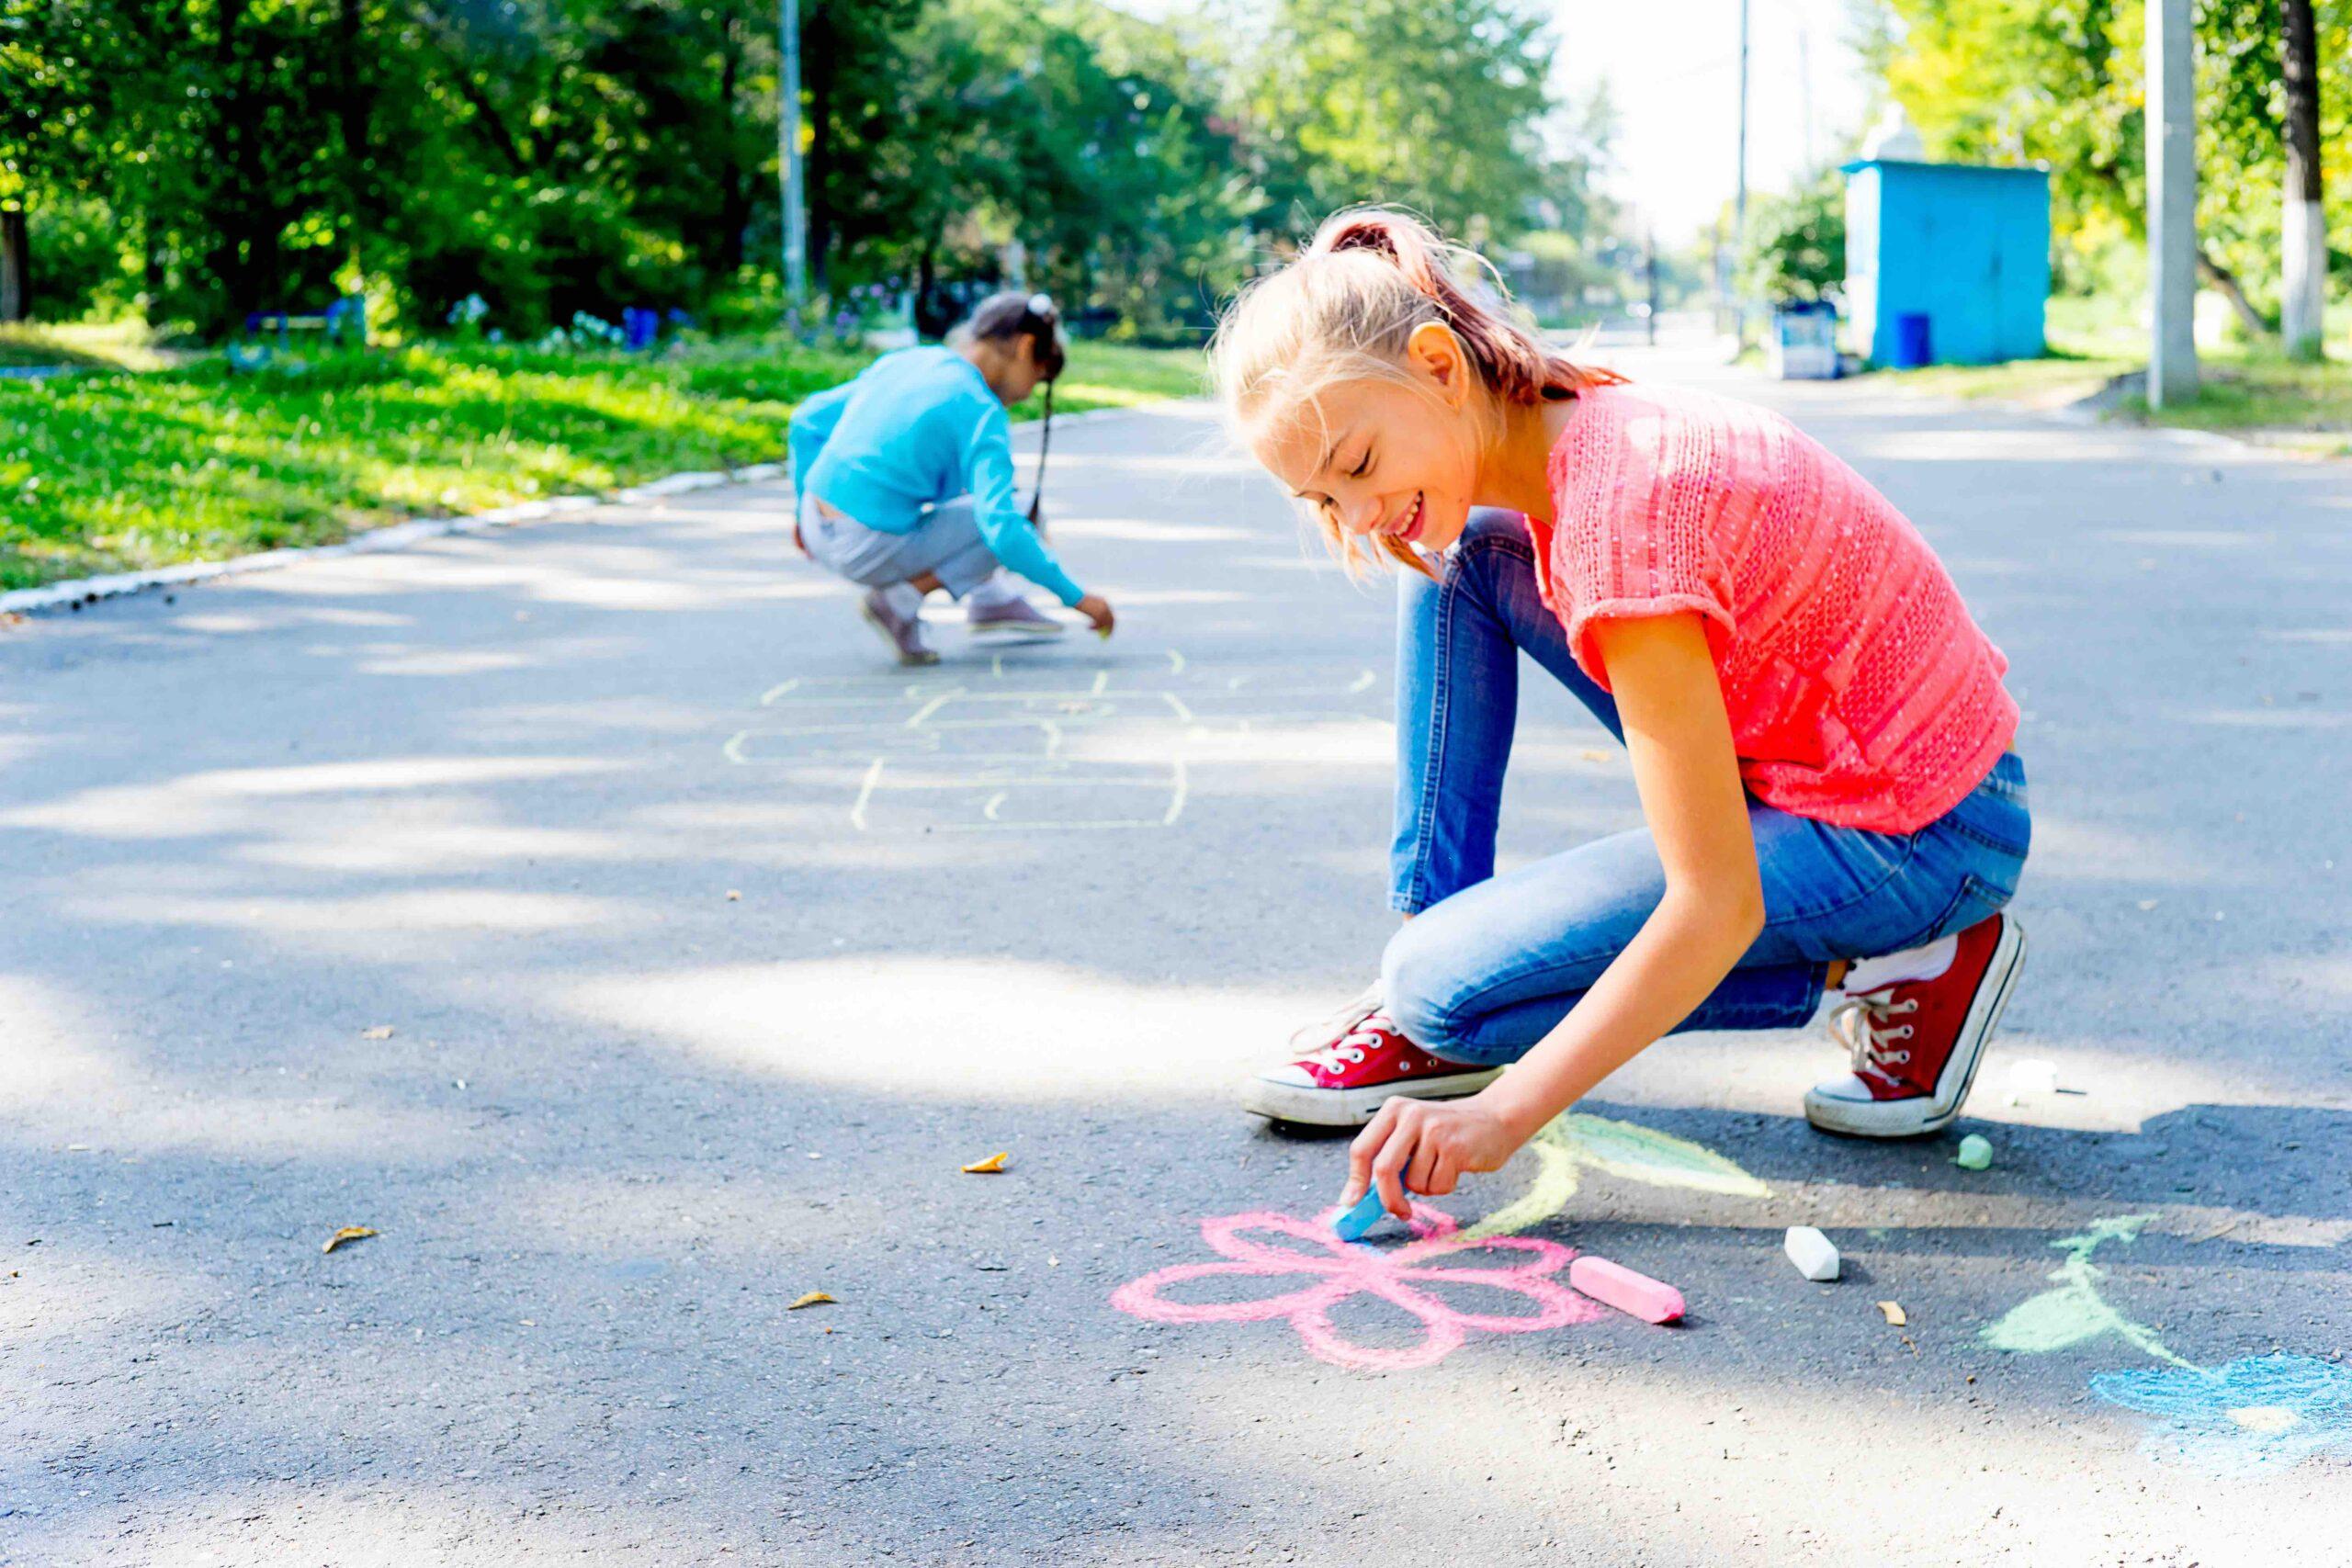 Create Art Studio in person summer camp outdoor art fun with chalk